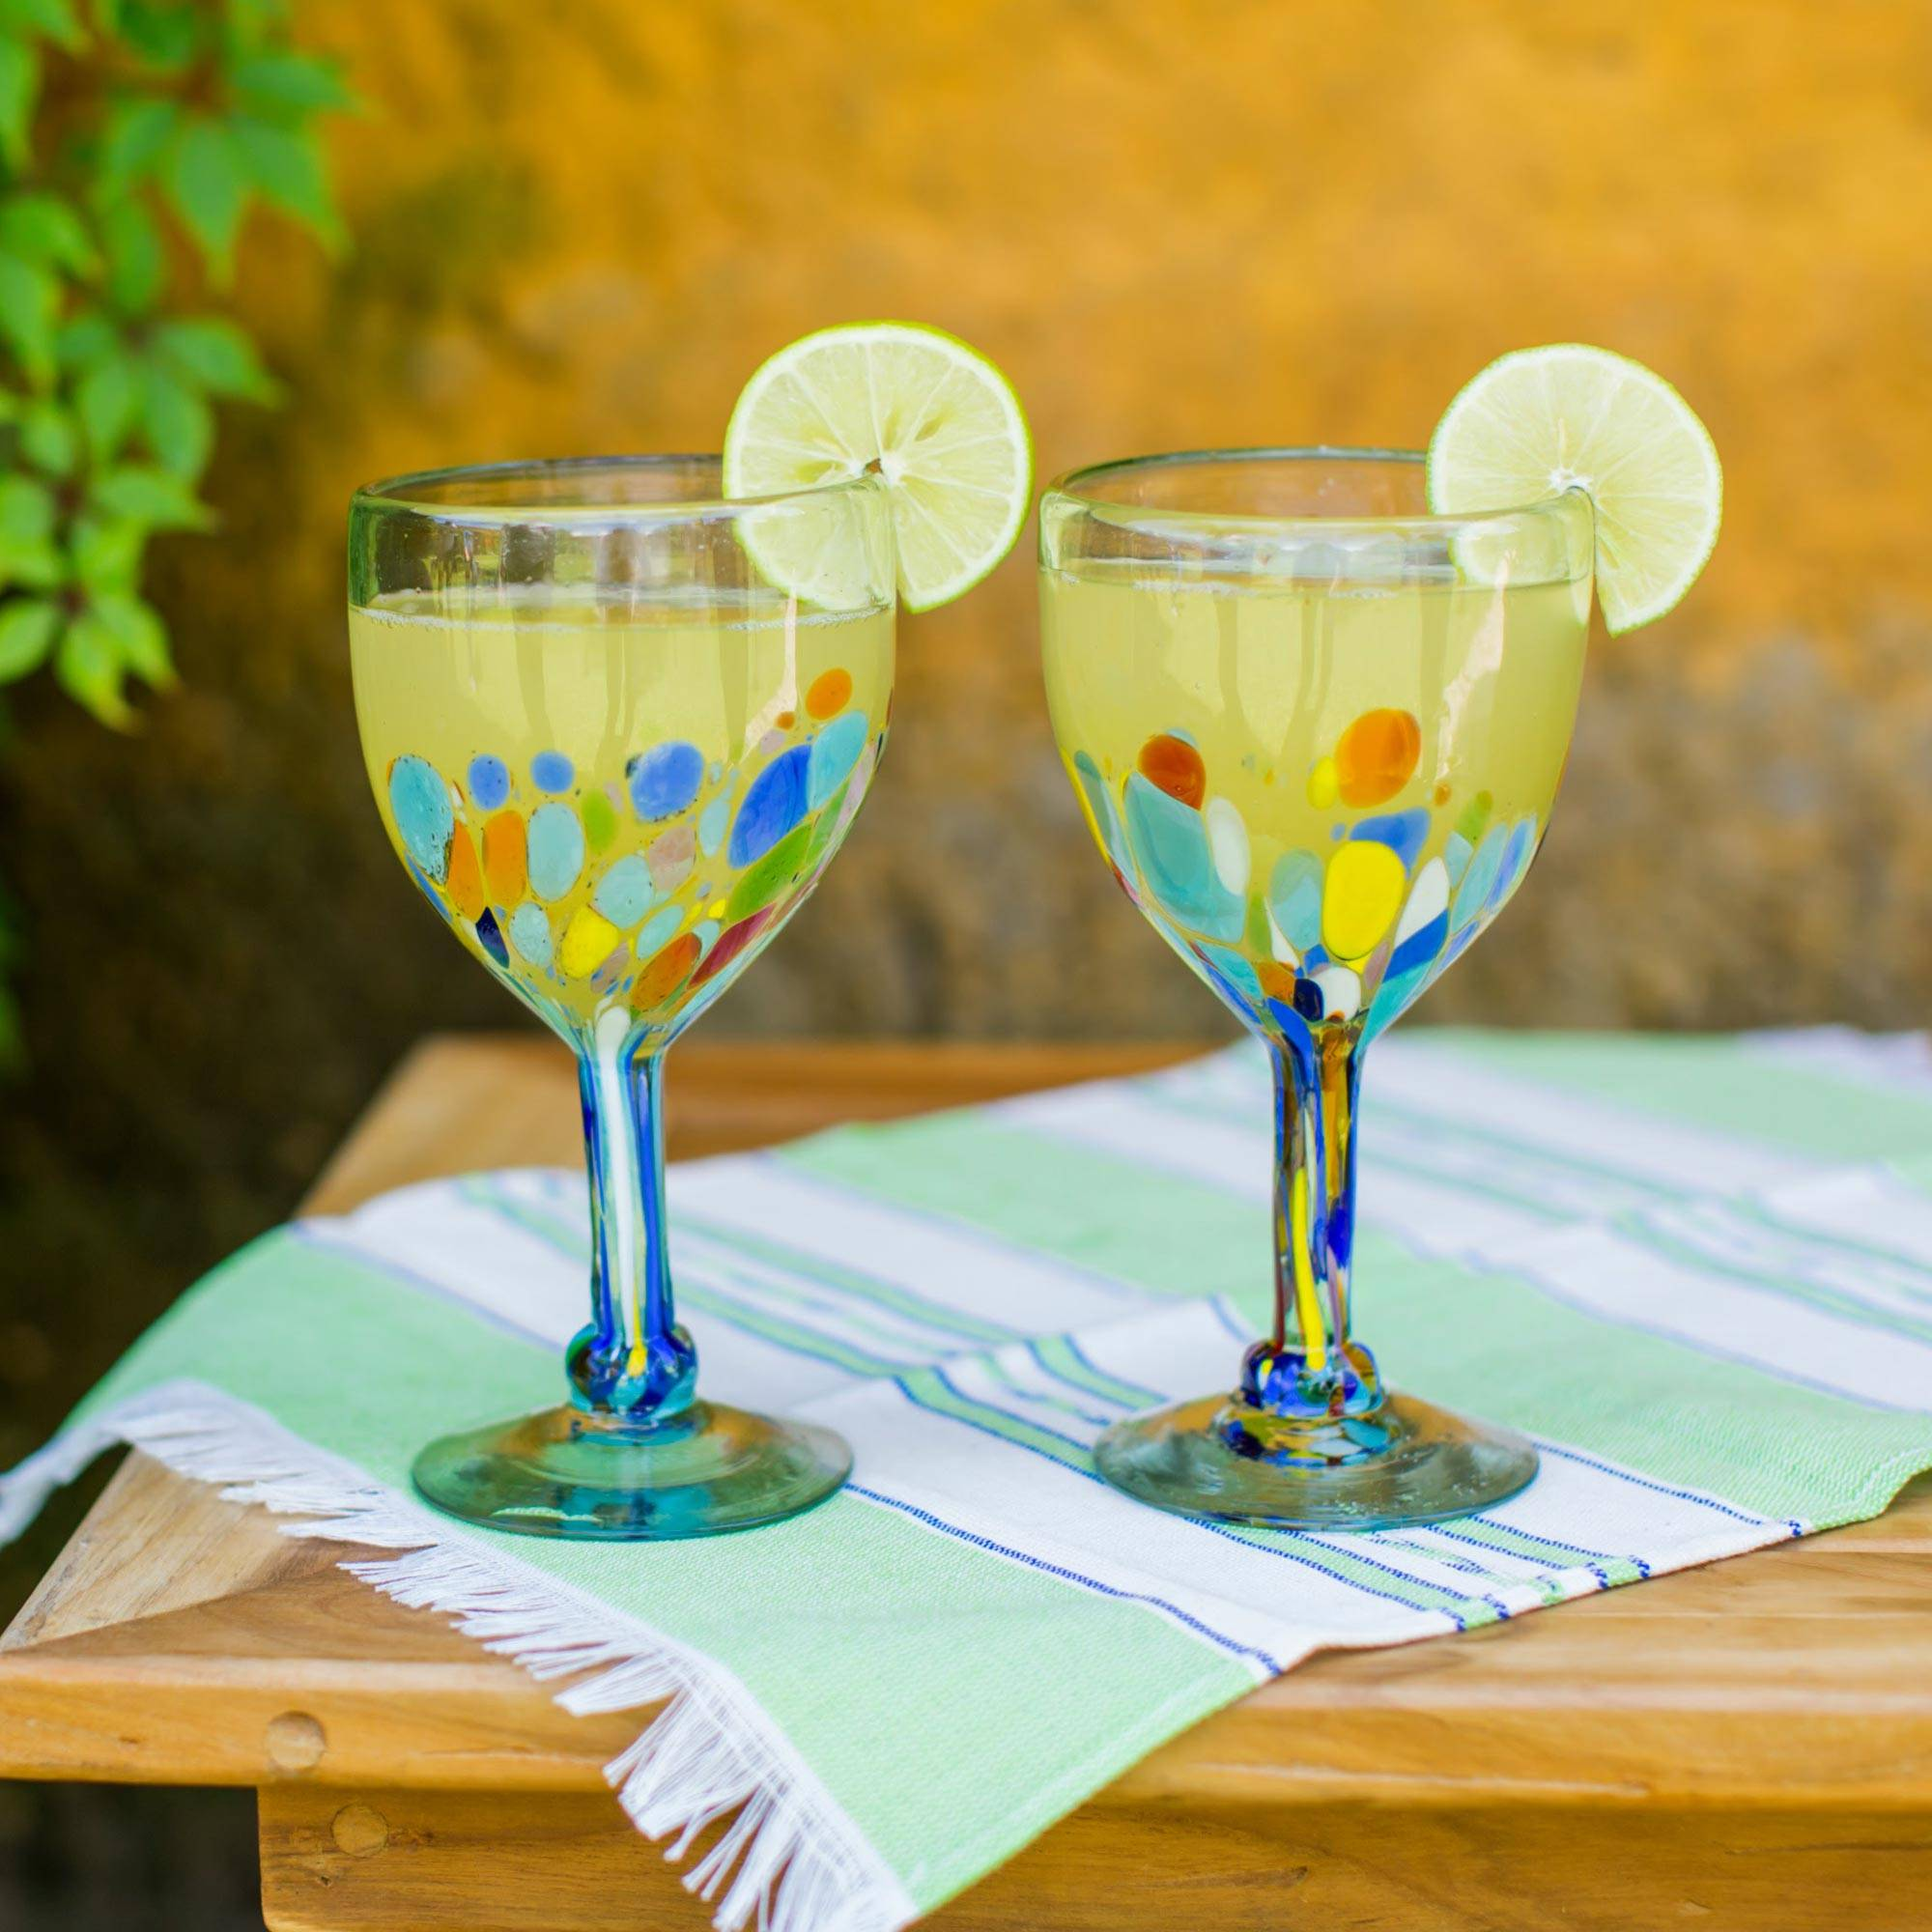 https://www.novica.com/p/hand-blown-colorful-8-oz-wine-glasses-set/256164/